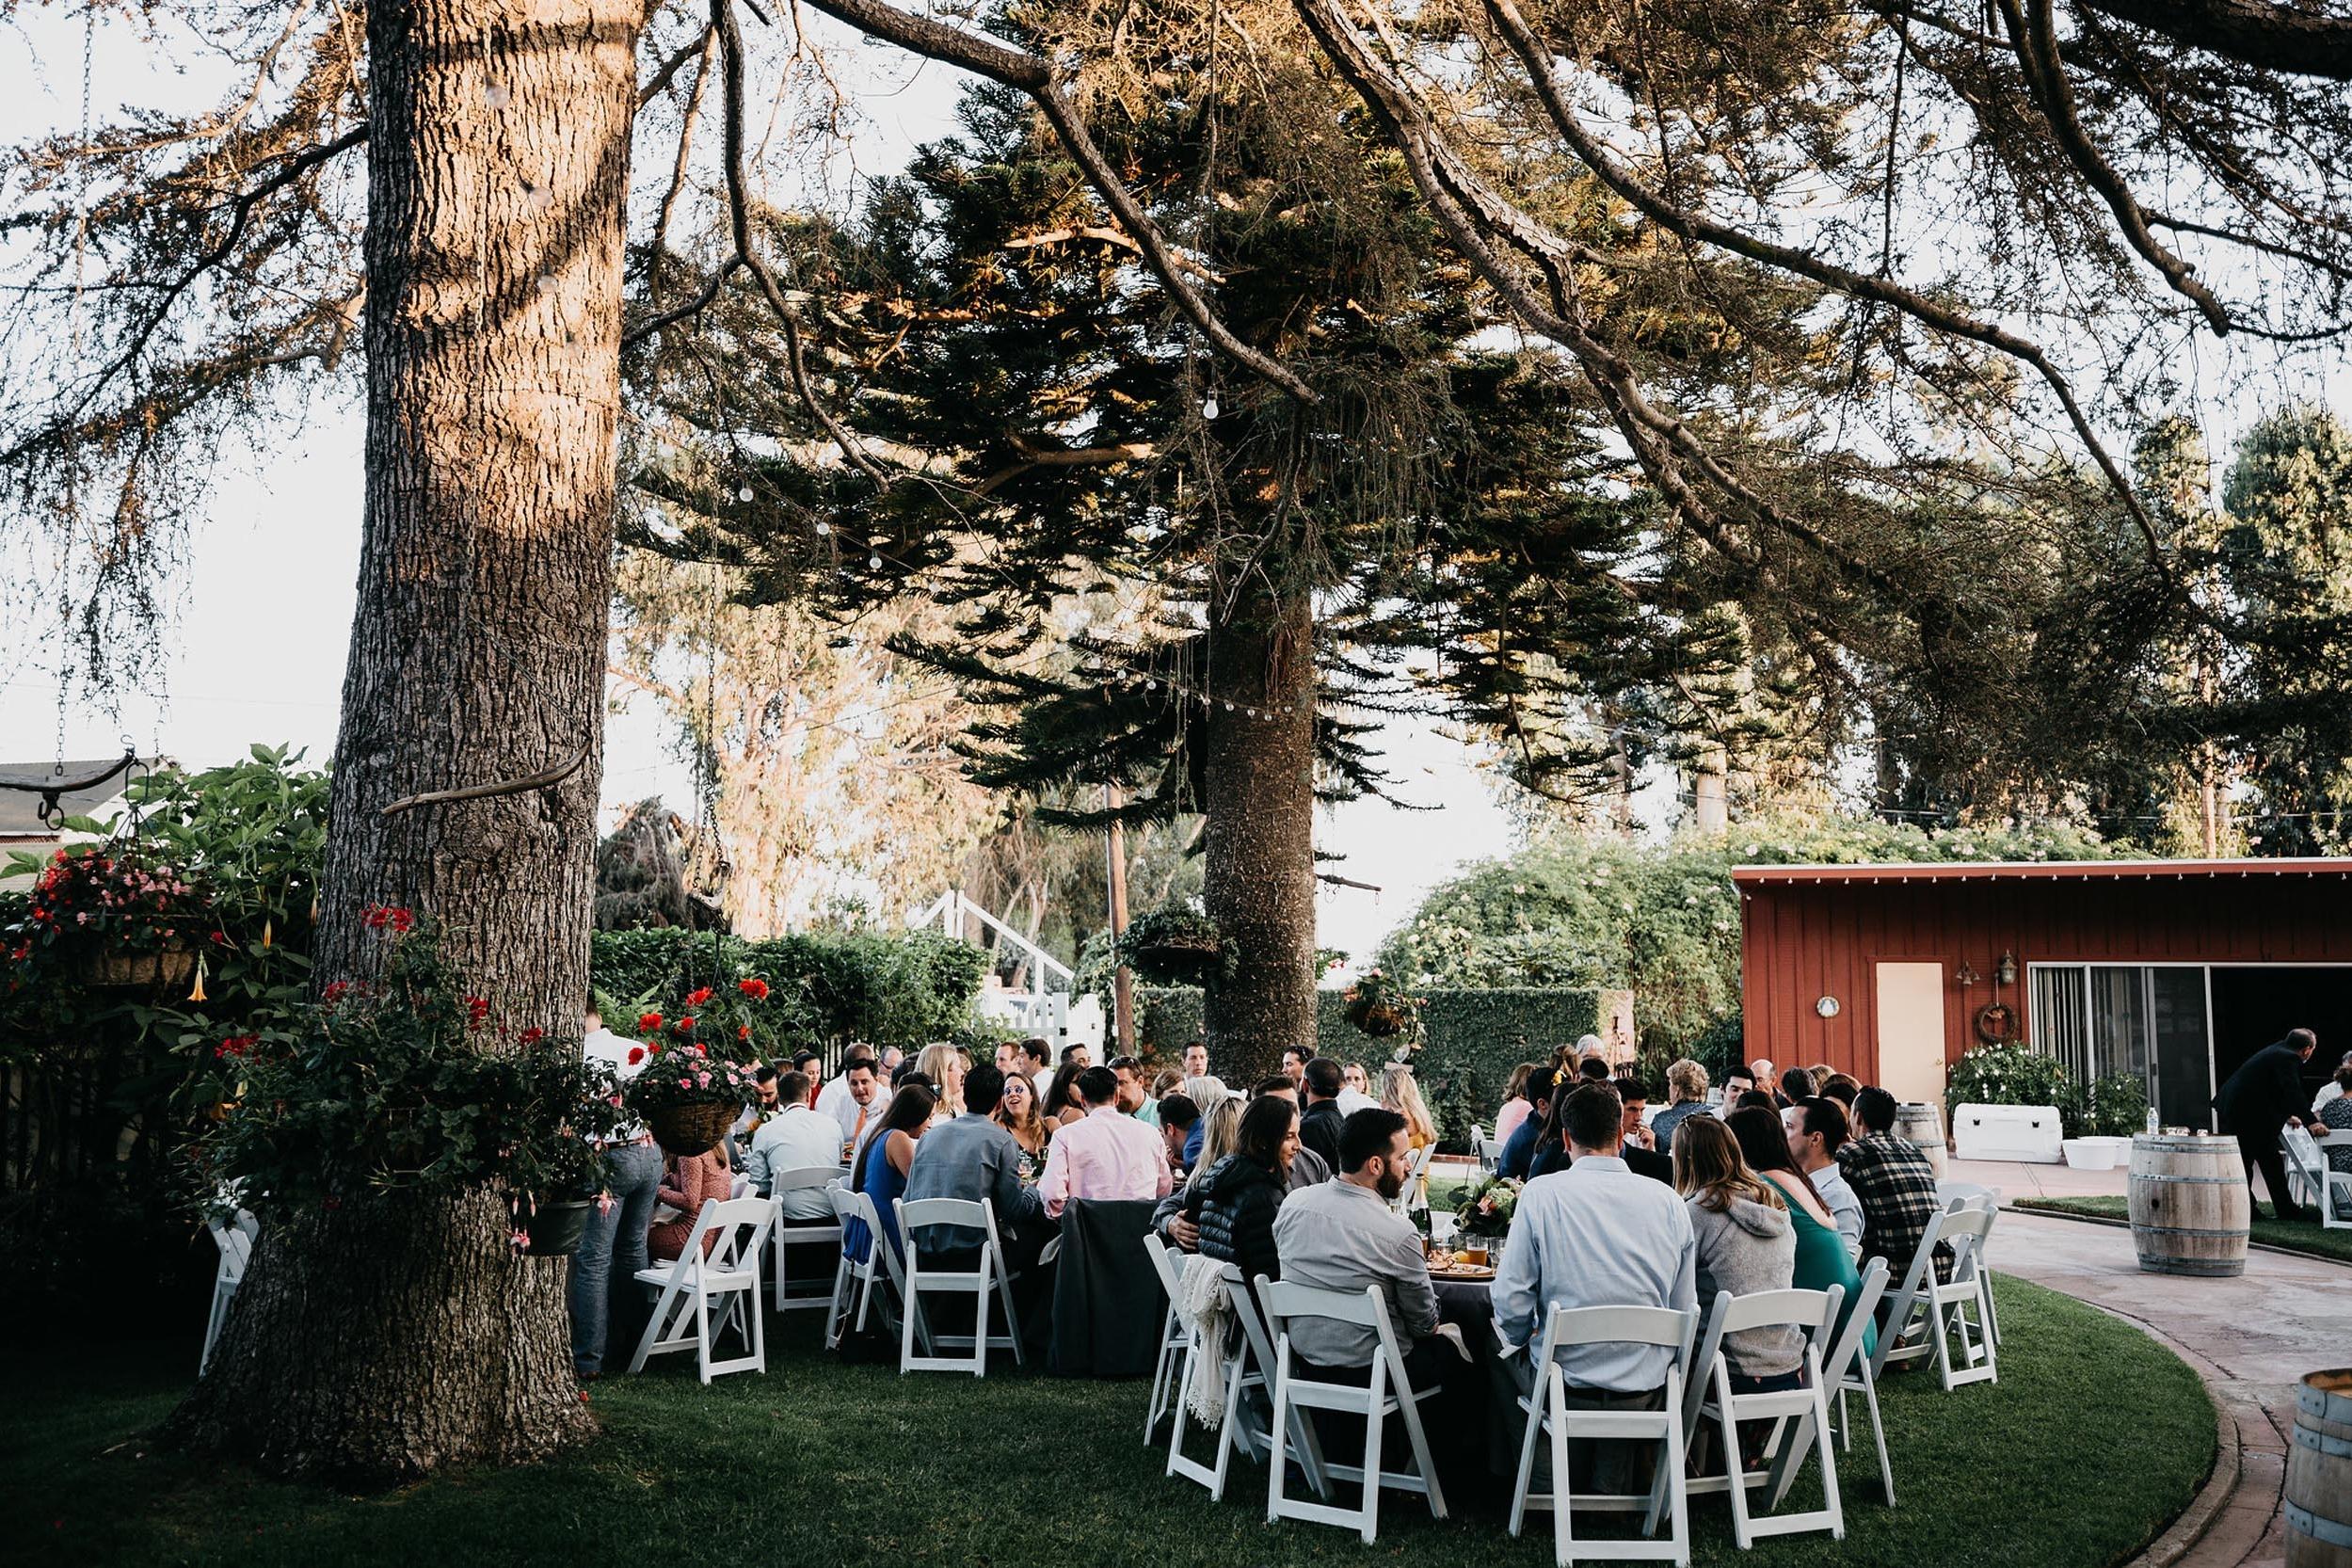 mcgrath-ranch-garden-wedding-venue-geoff-lyndsi-photography-082.jpg